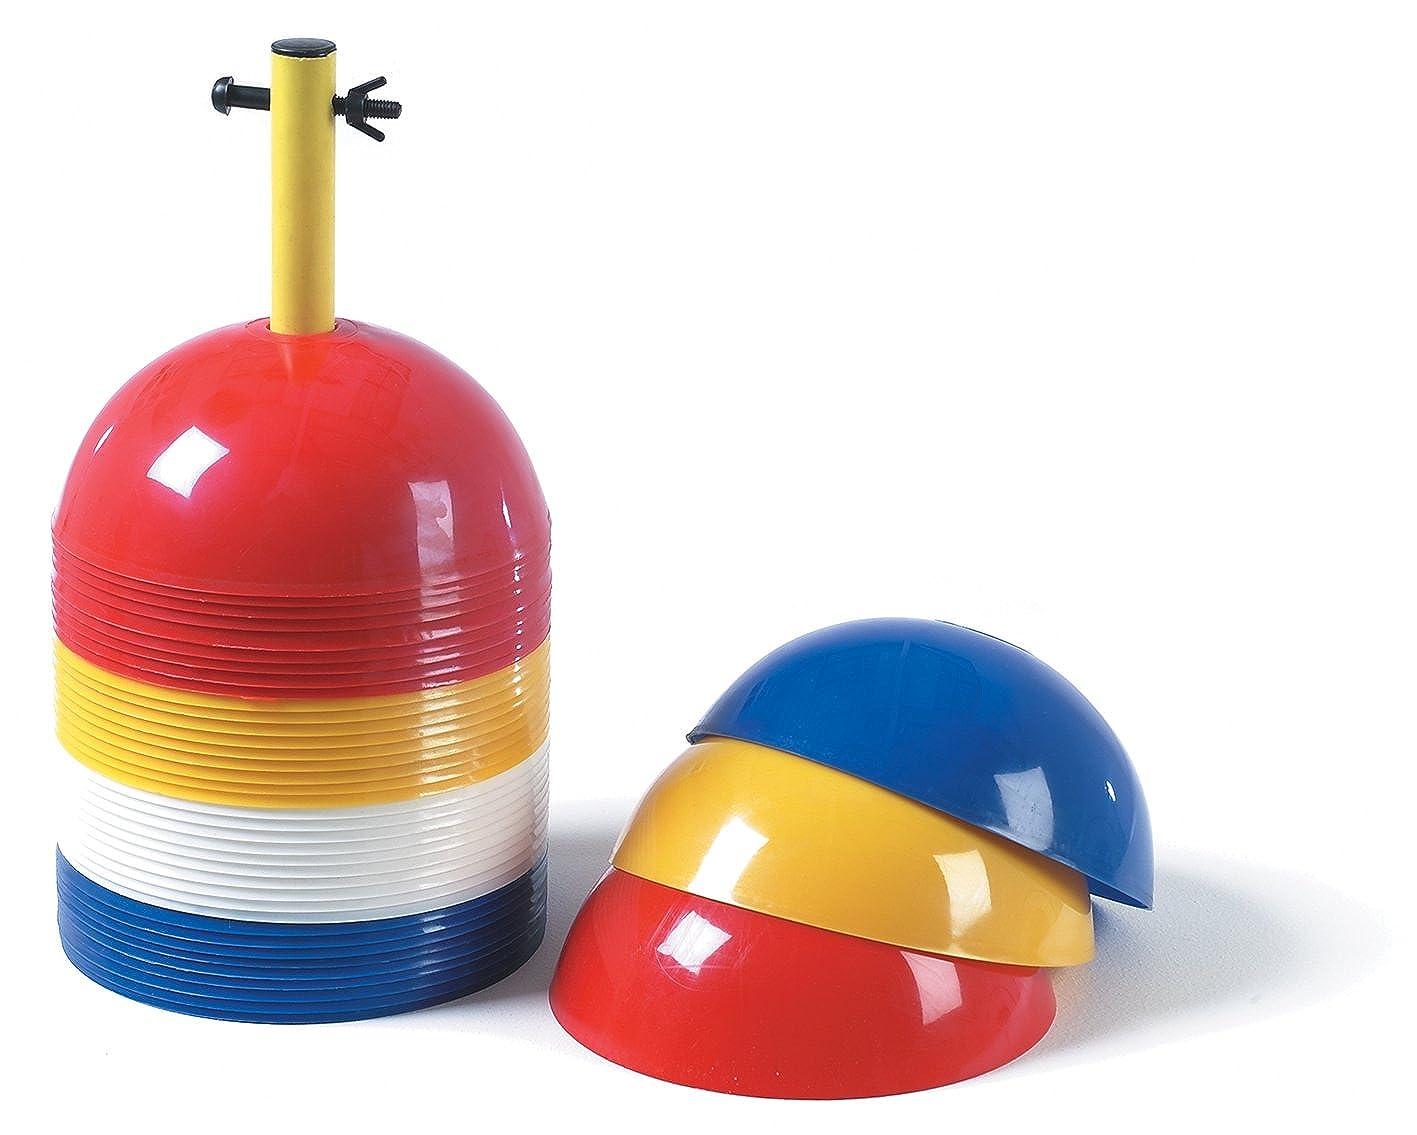 Precision Training sport marcatori 40PK Coni tondi tipo cinesini diametro: 20 cm Sports (Gelb/Rot/Weiß/Blau)